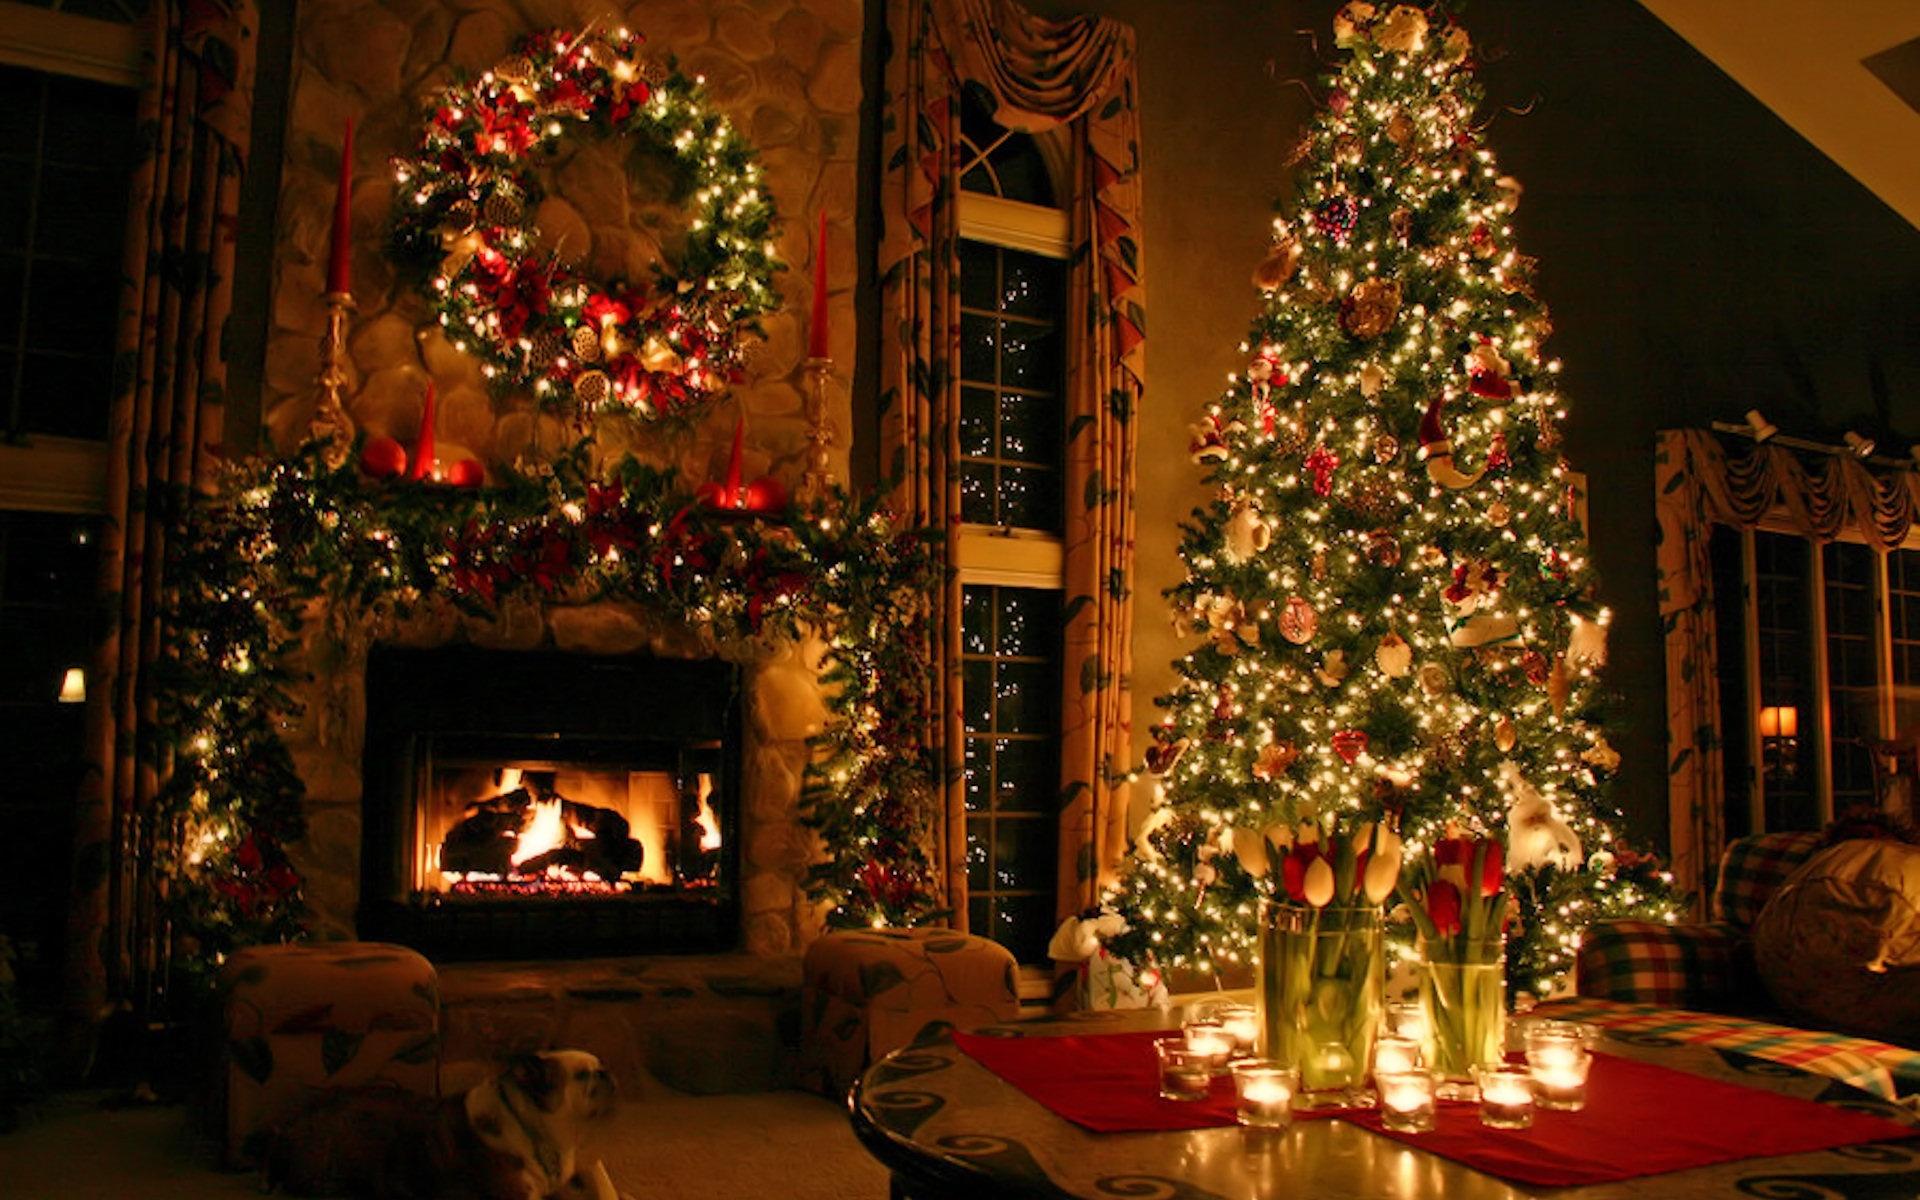 christmas-pictures-for-desktop-x-Stunningly-Beautiful-Christmas-Desktop-wallpaper-wp4604749